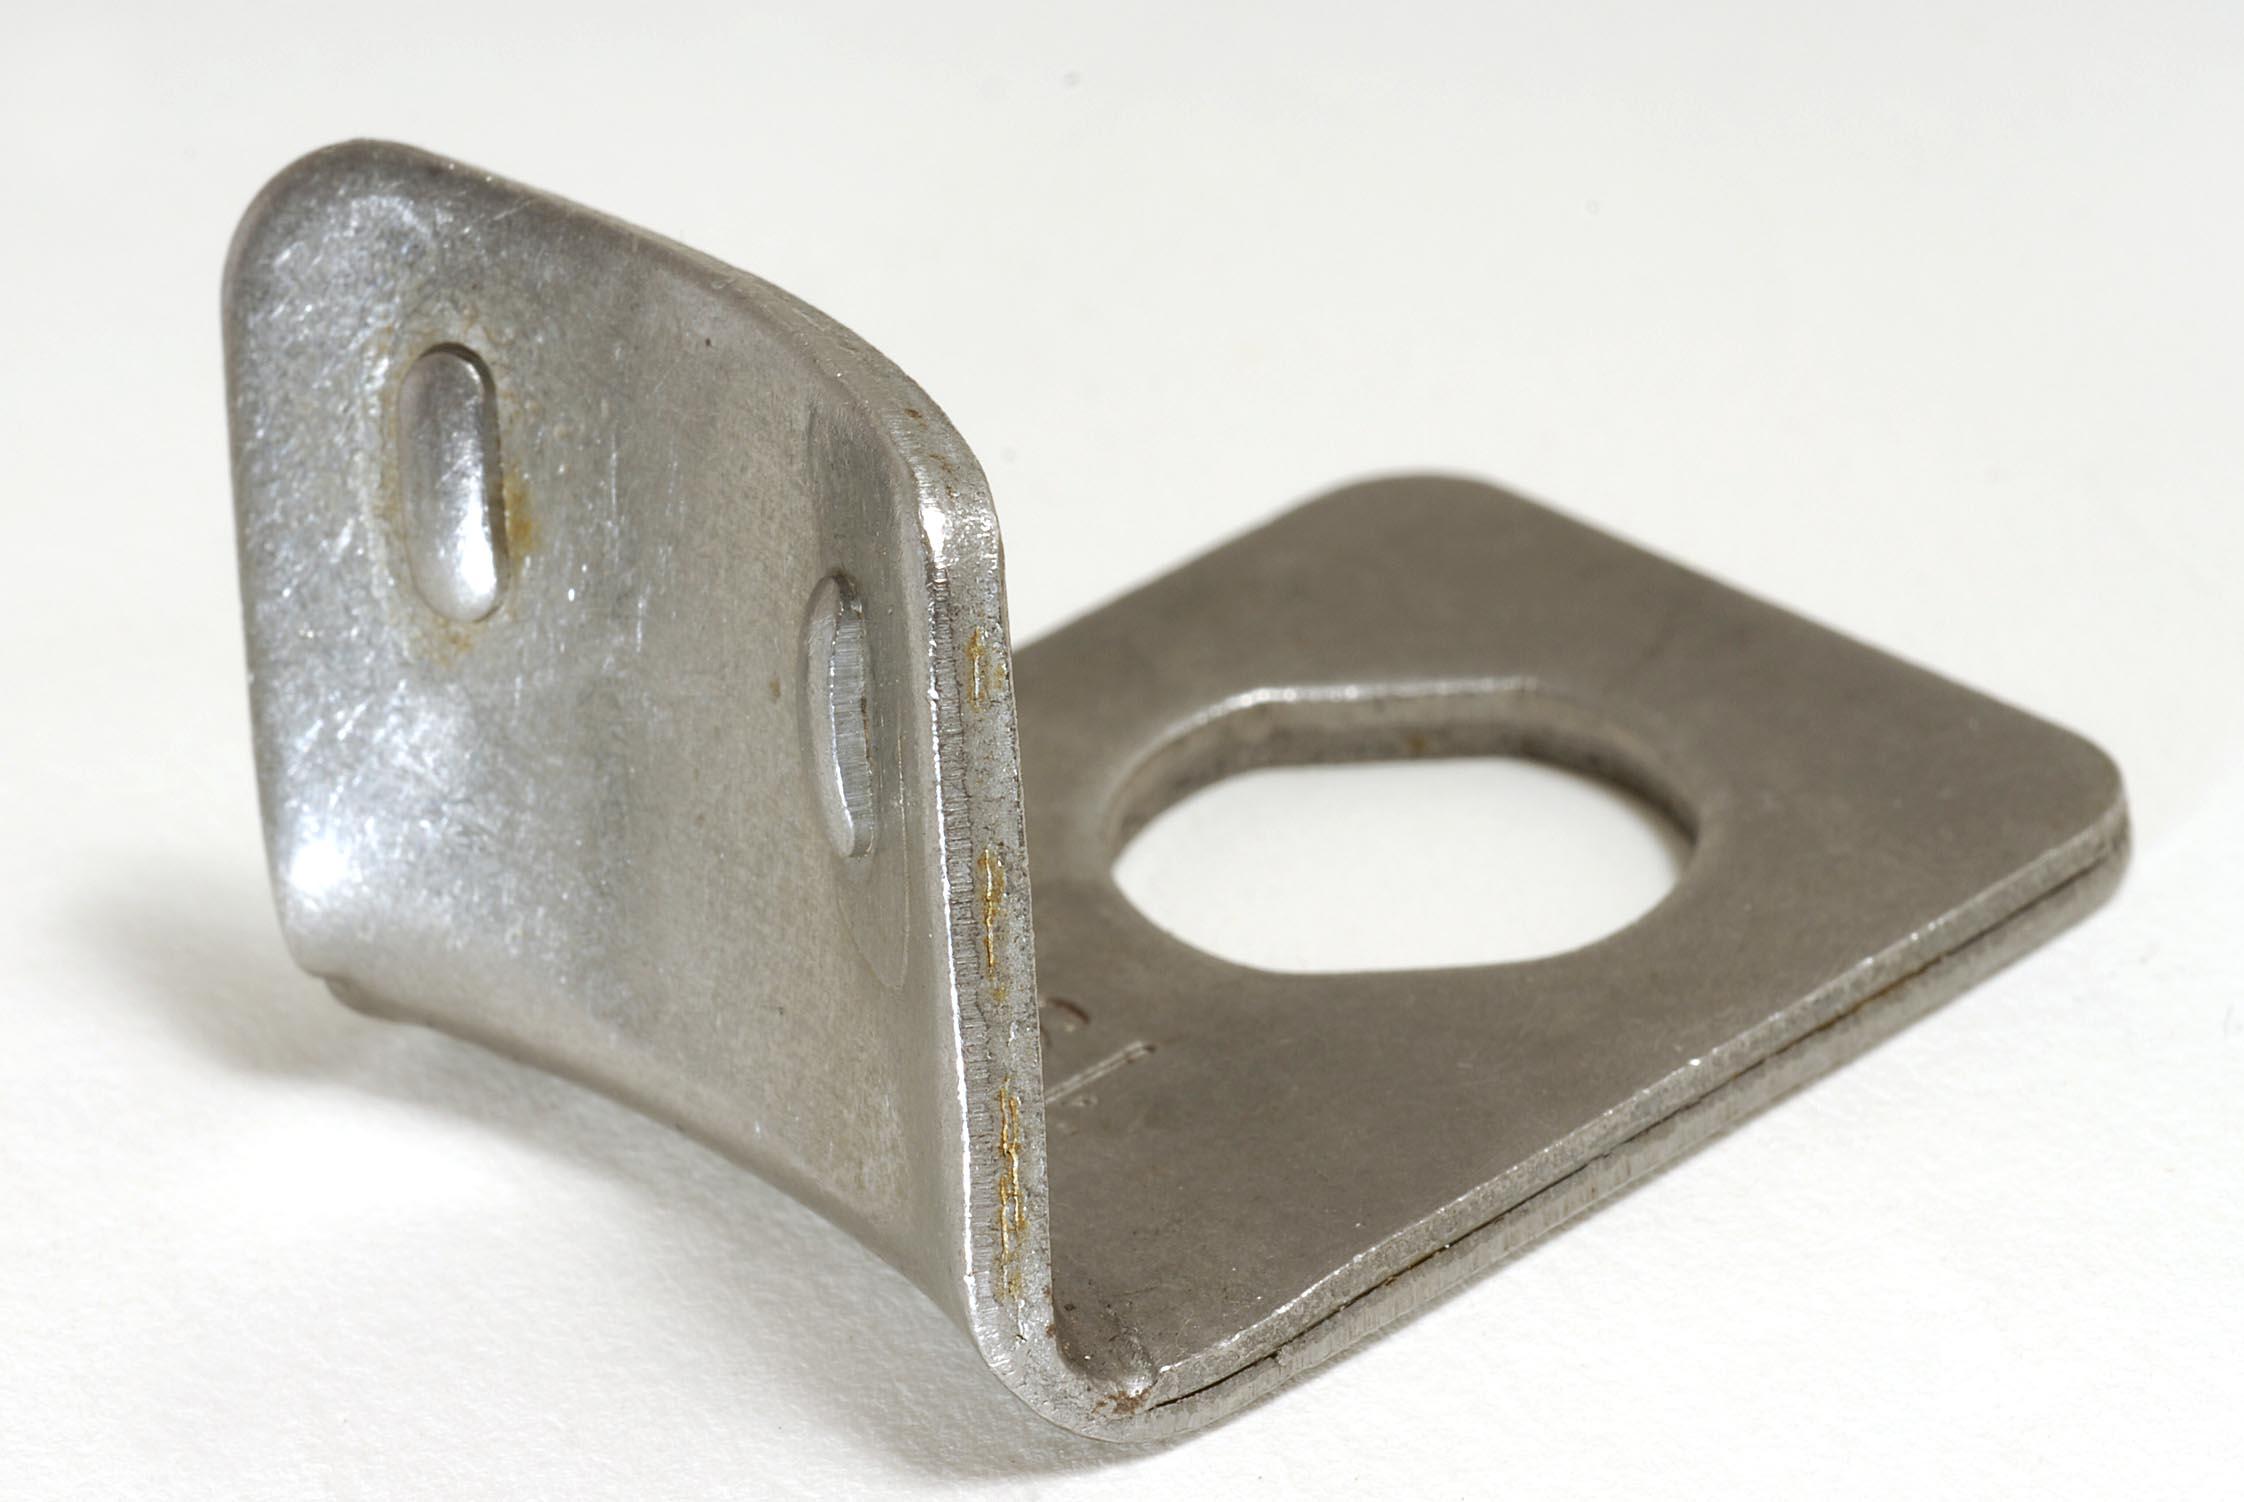 lino-del-bianco-piezas-autopartes-bracket-fricrot-4